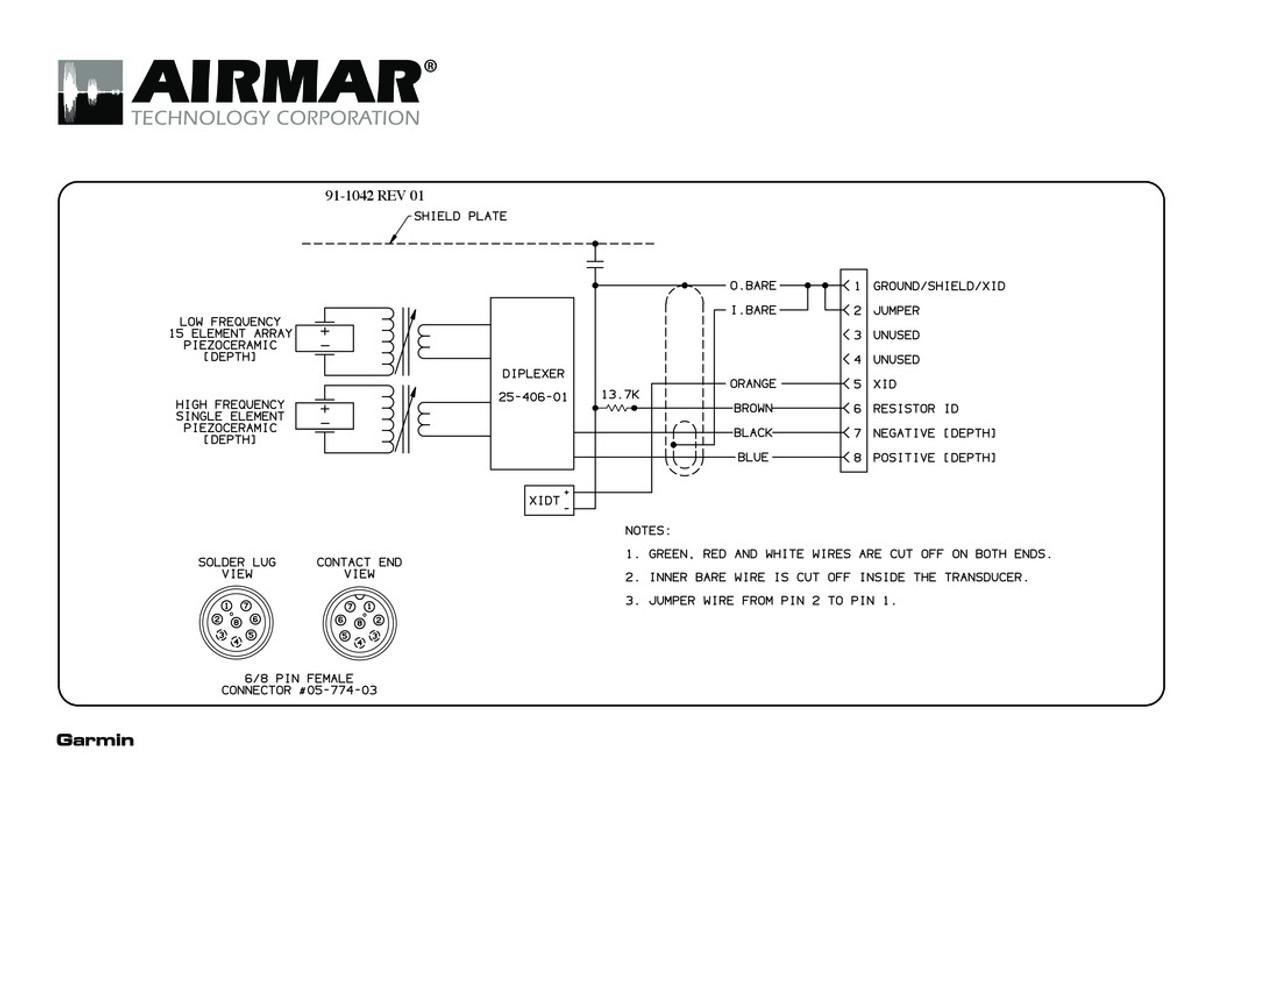 18 5 wiring diagram garmin wiring diagram g9 channel master wiring diagram 18 5 wiring diagram [ 1280 x 989 Pixel ]